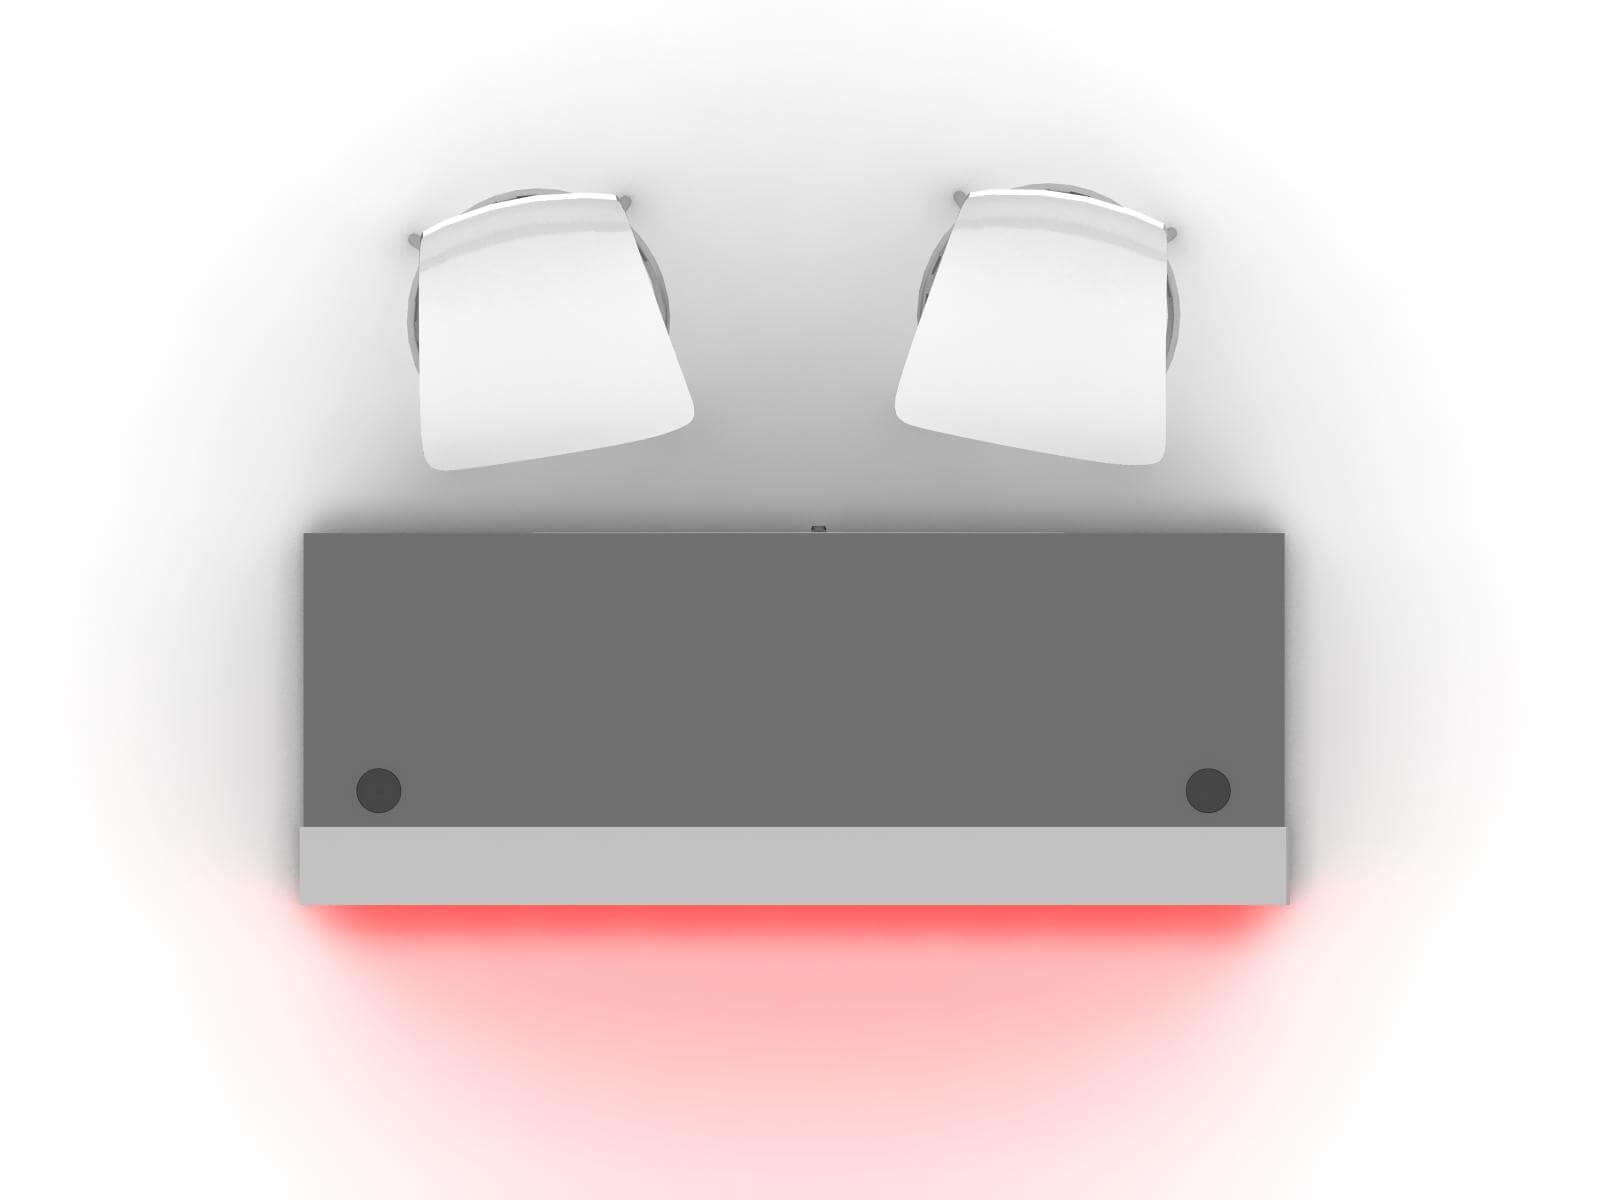 MOD-1595 Custom Backlit Trade Show Reception Counter - Plan View